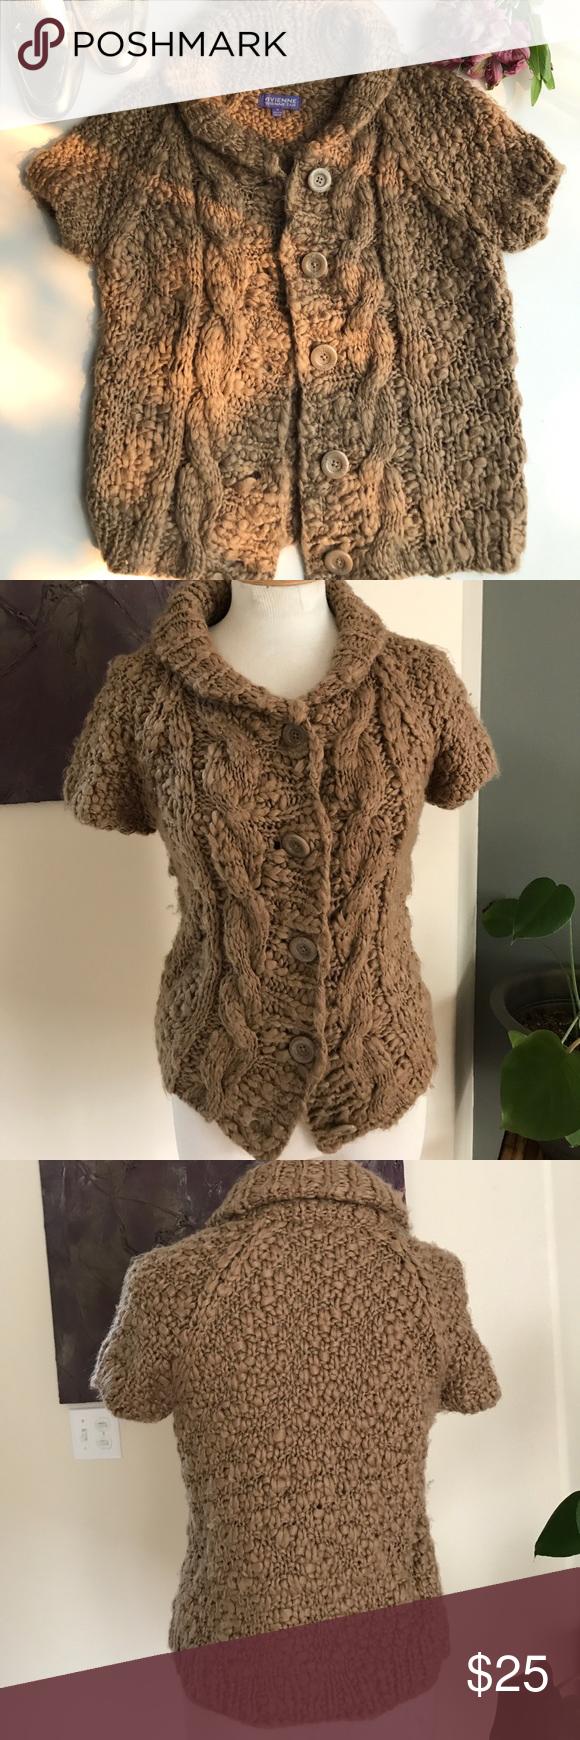 Vivienne Tam Chunky Knit Short Sleeve Cardigan | Knit shorts ...